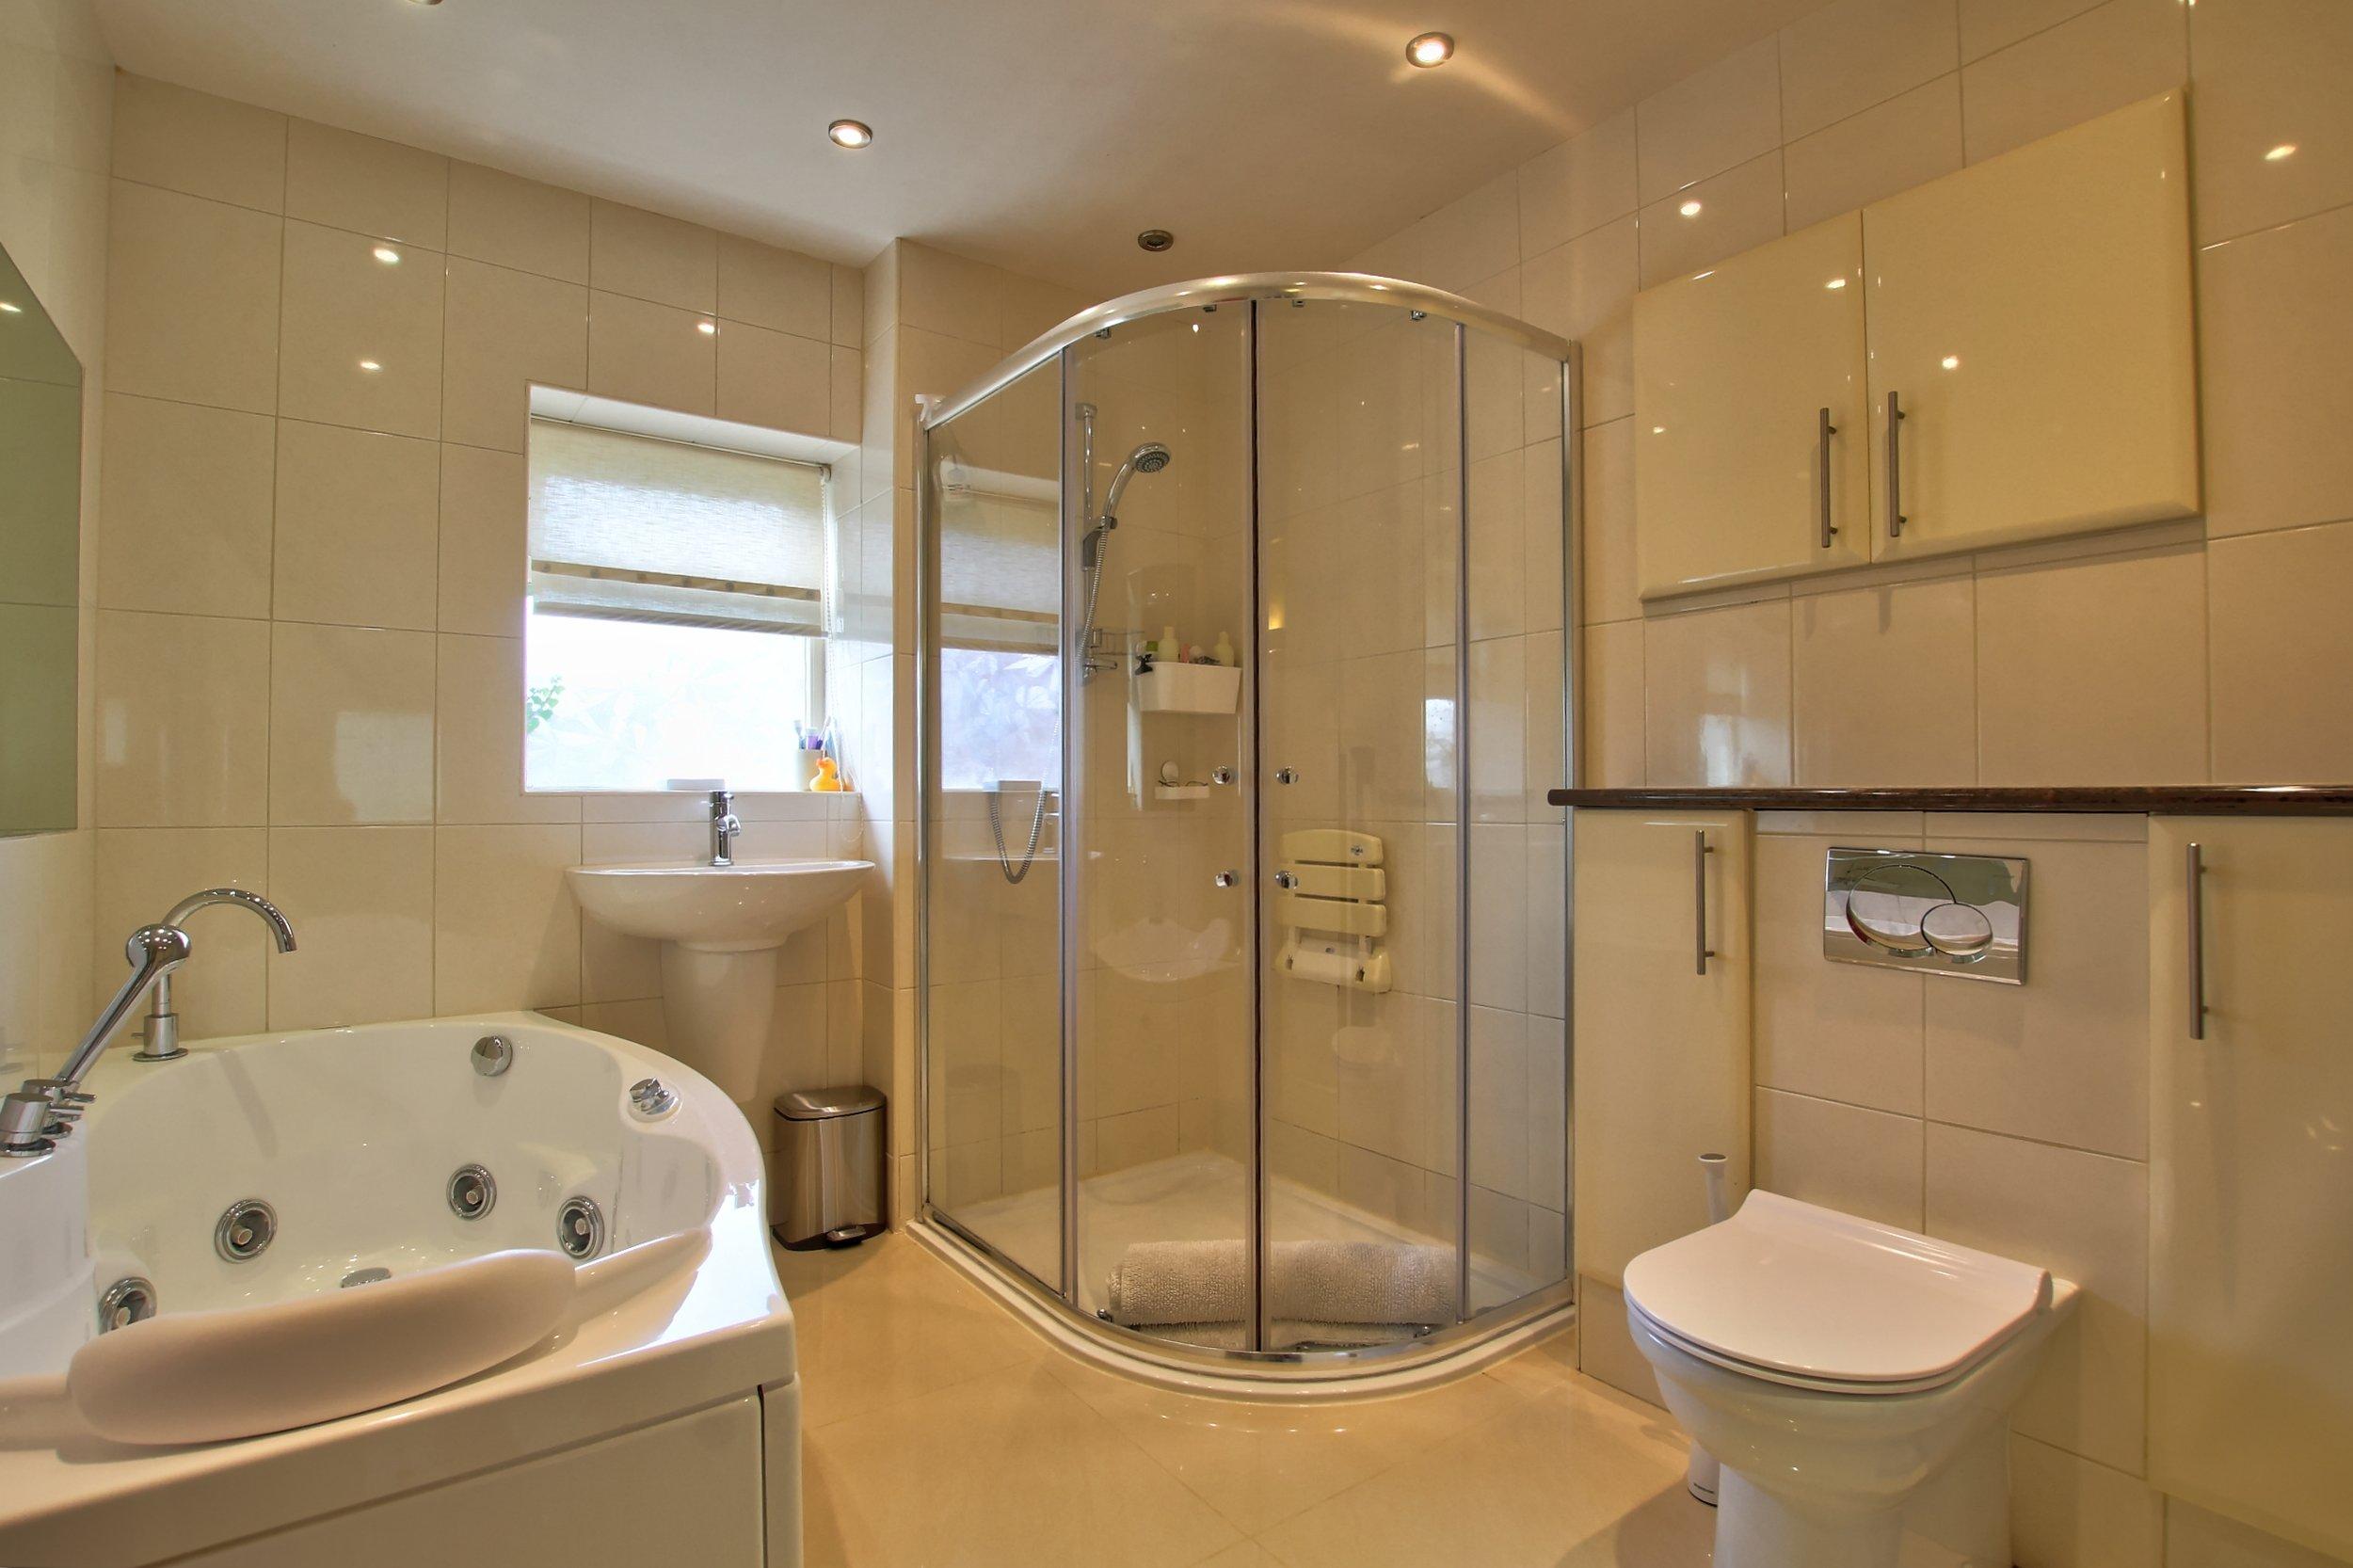 28 family bathroom.jpg